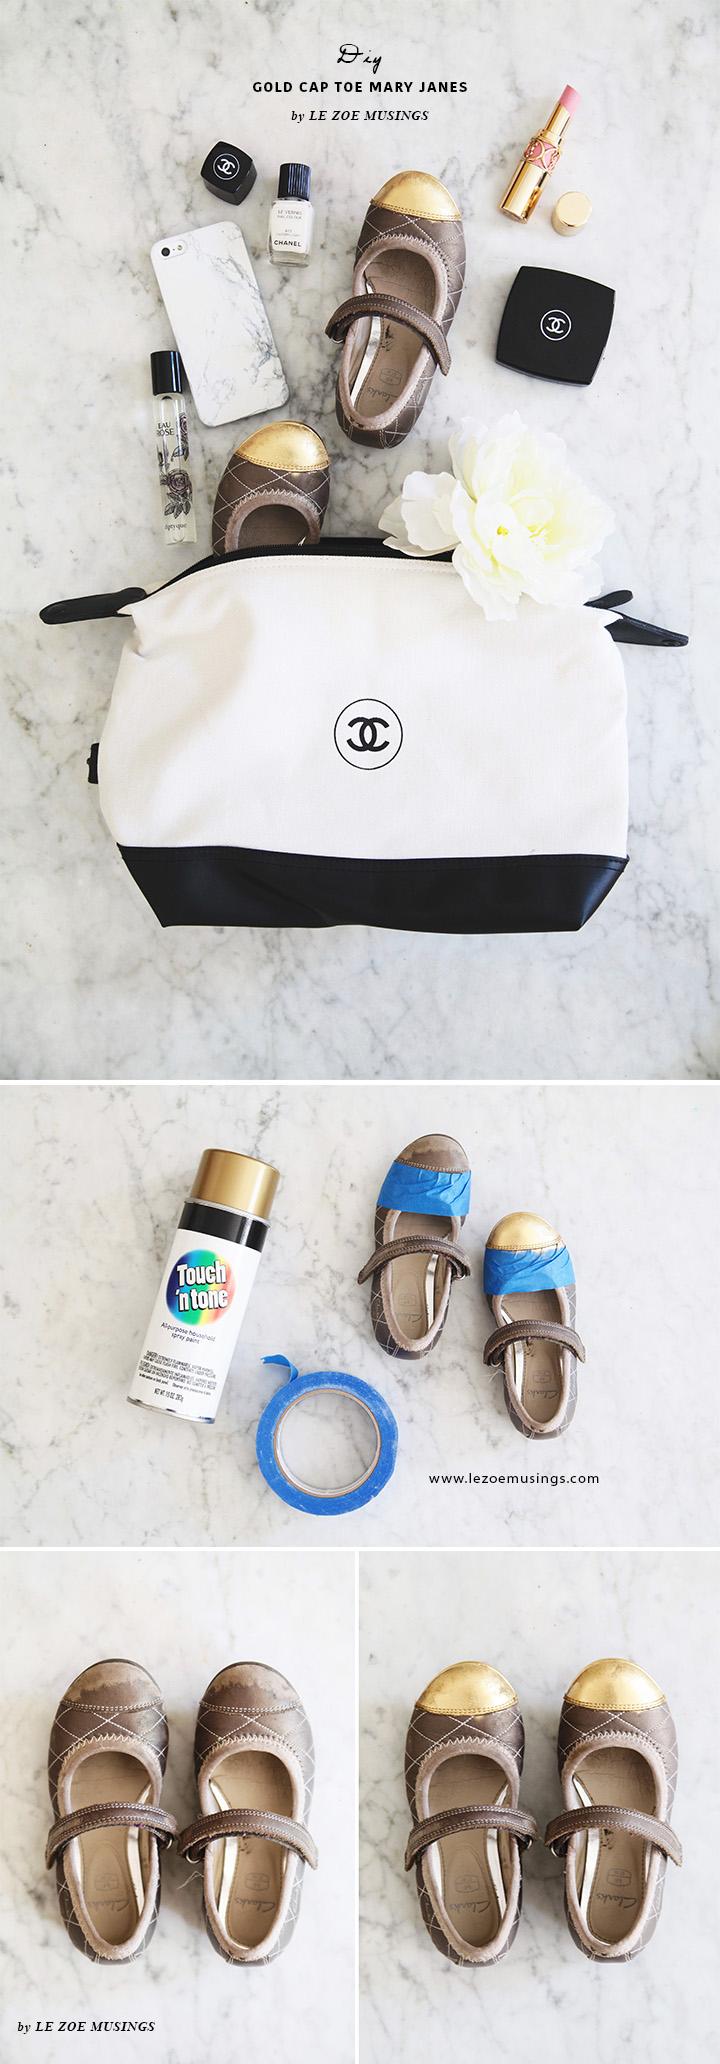 DIY Gold Cap Toe Mary Janes by Le Zoe Musings4